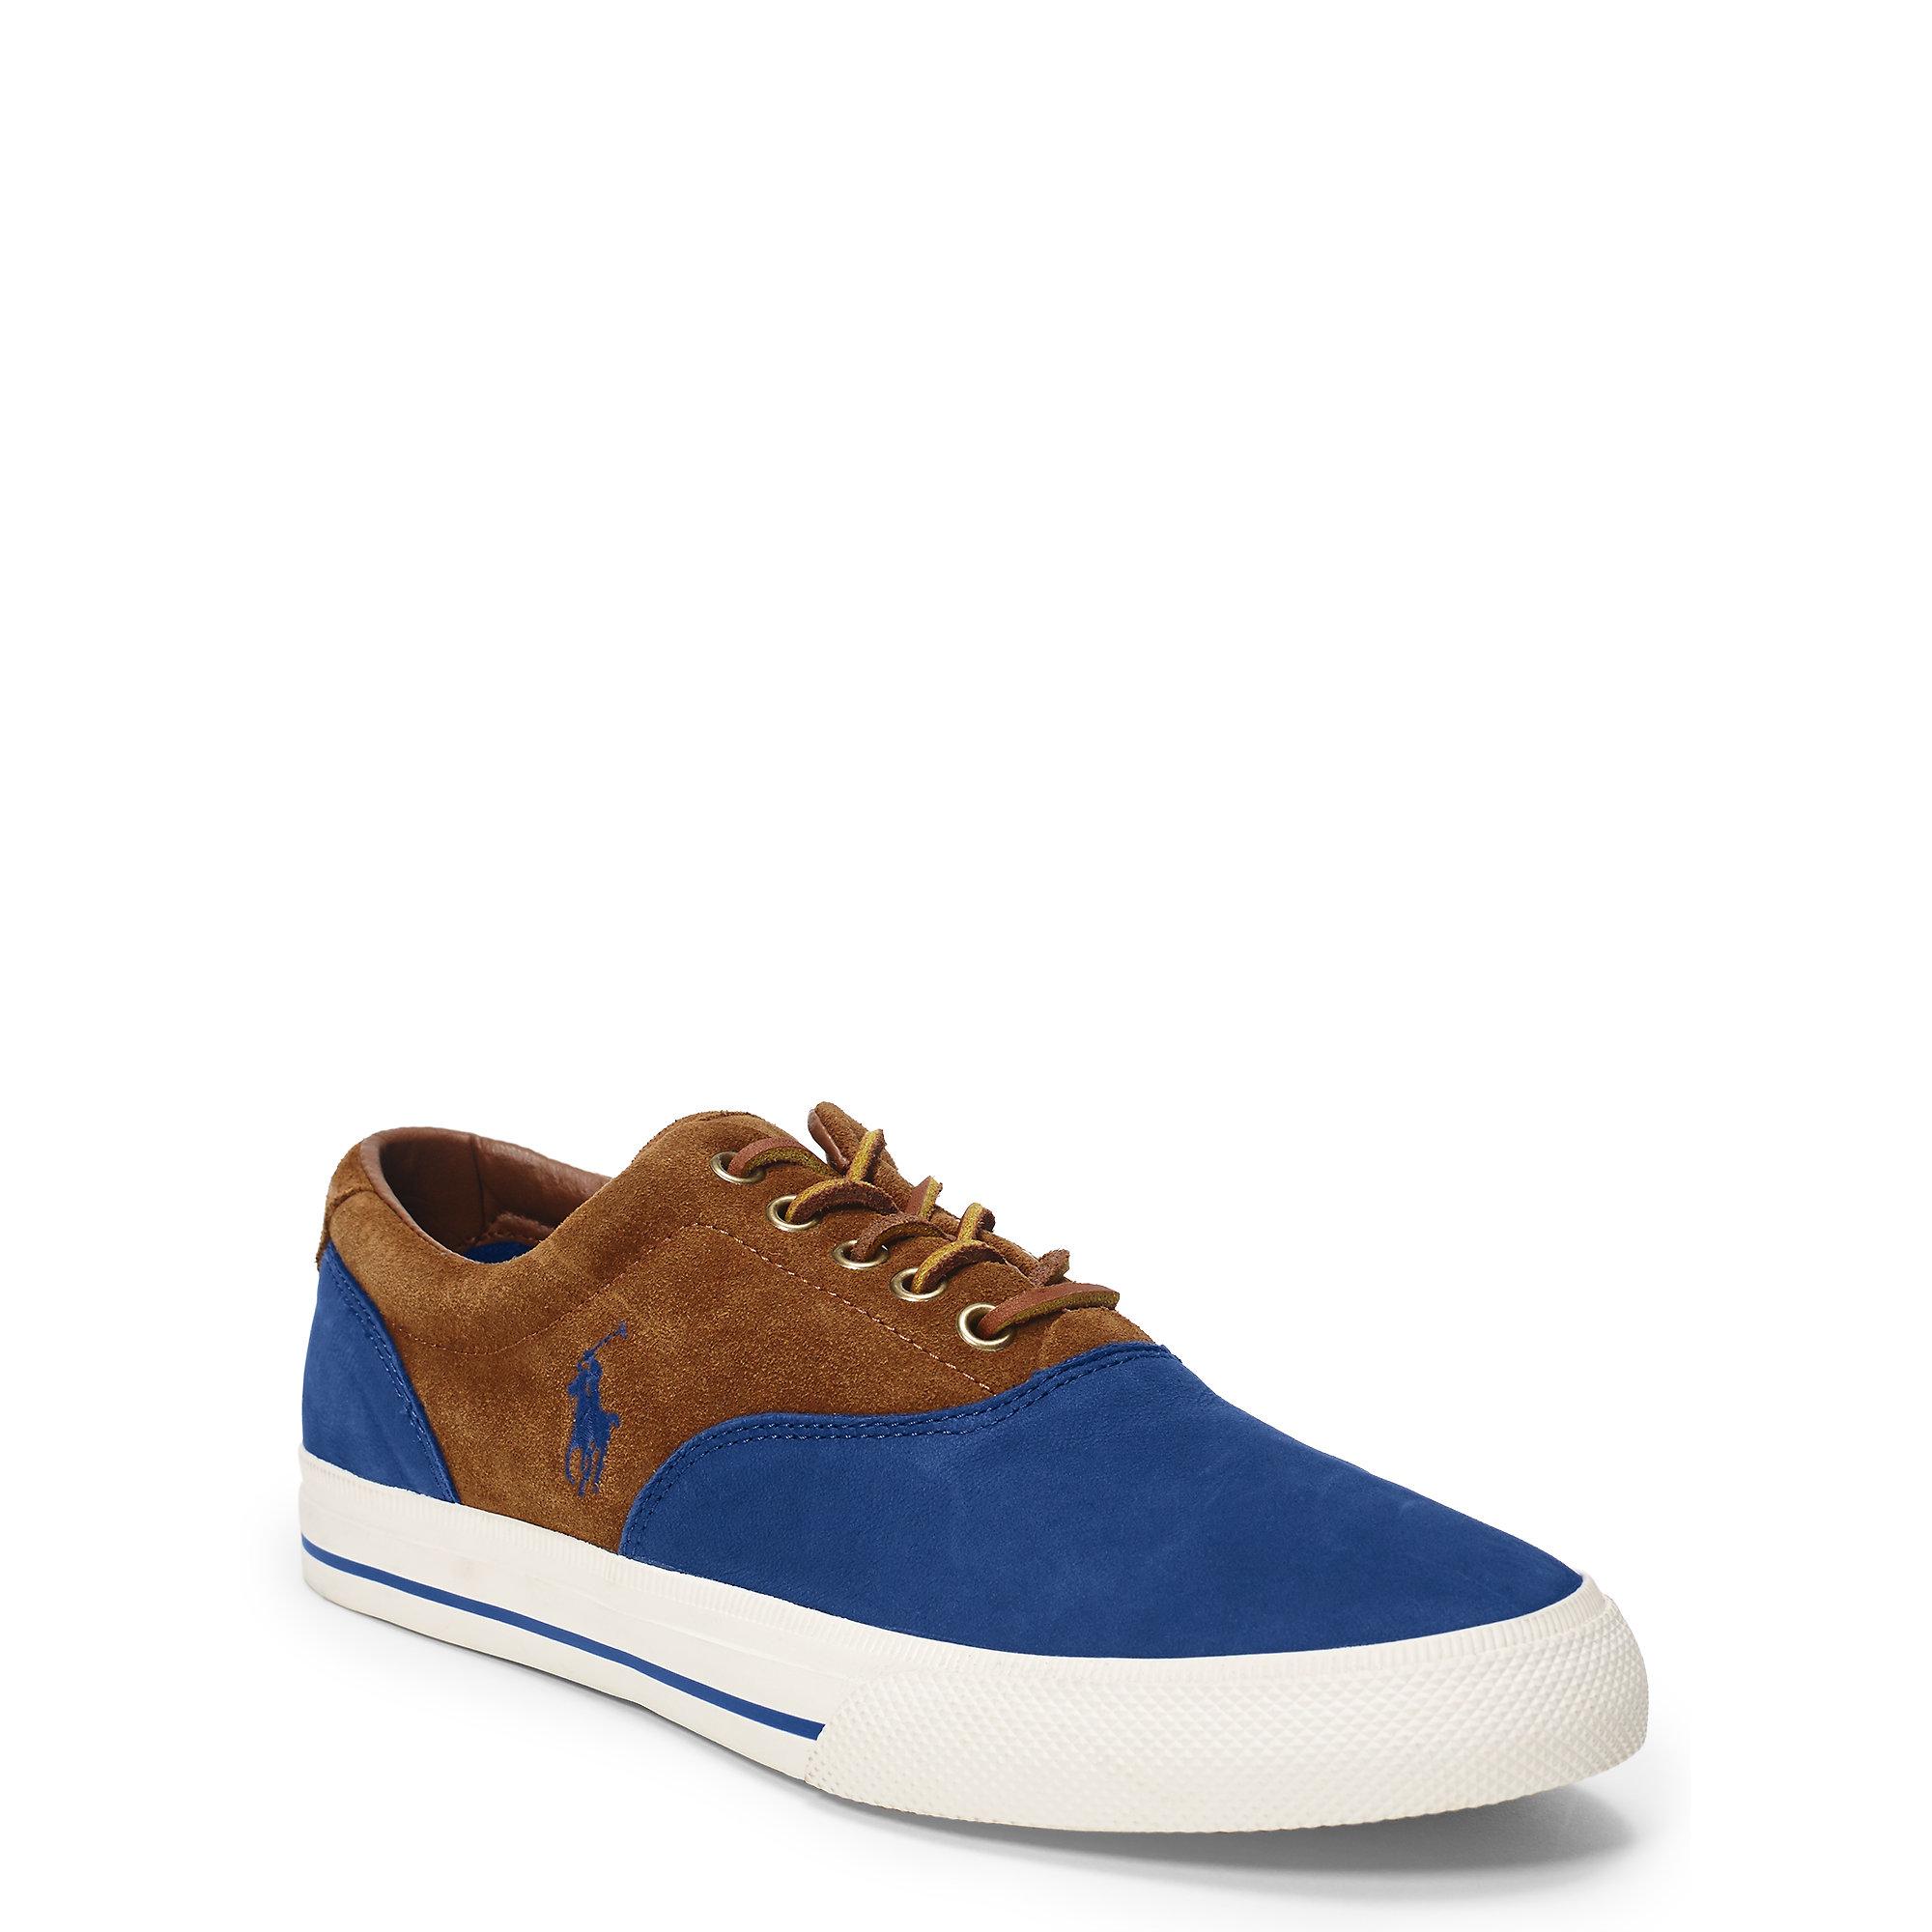 polo ralph lauren vaughn linen saddle sneaker in blue for men lyst. Black Bedroom Furniture Sets. Home Design Ideas